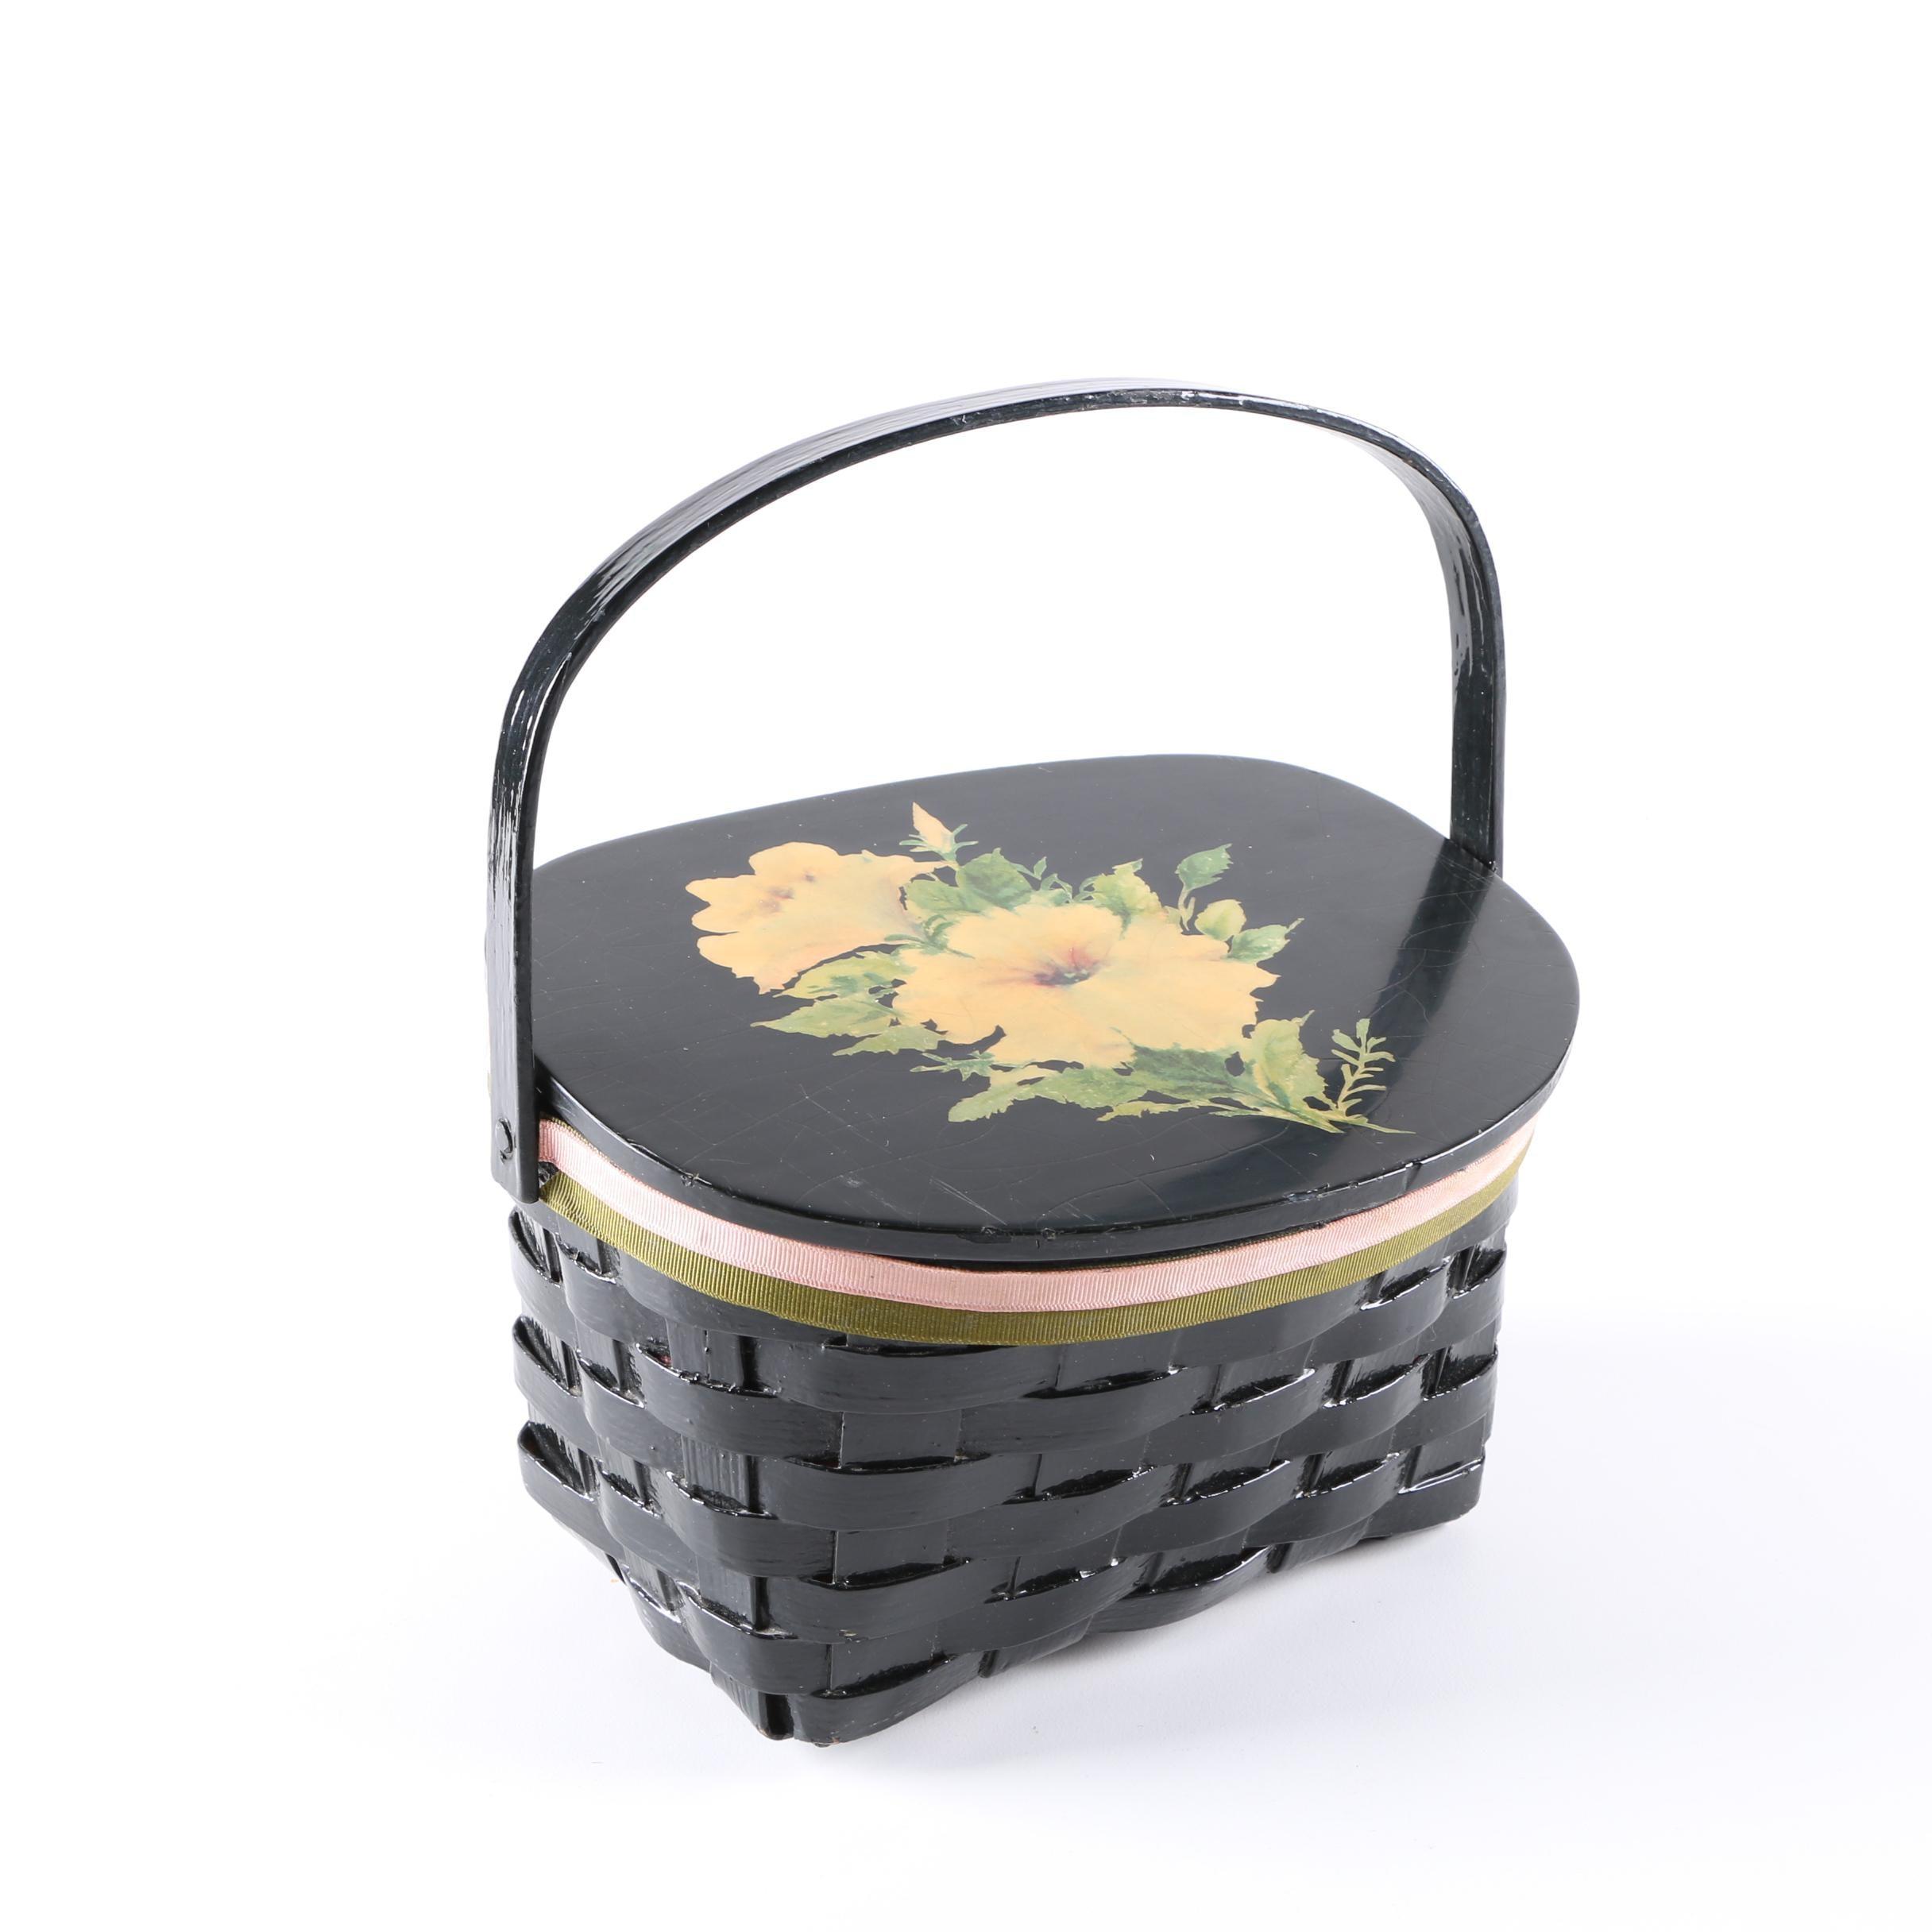 Vintage Woven Basket Handbag